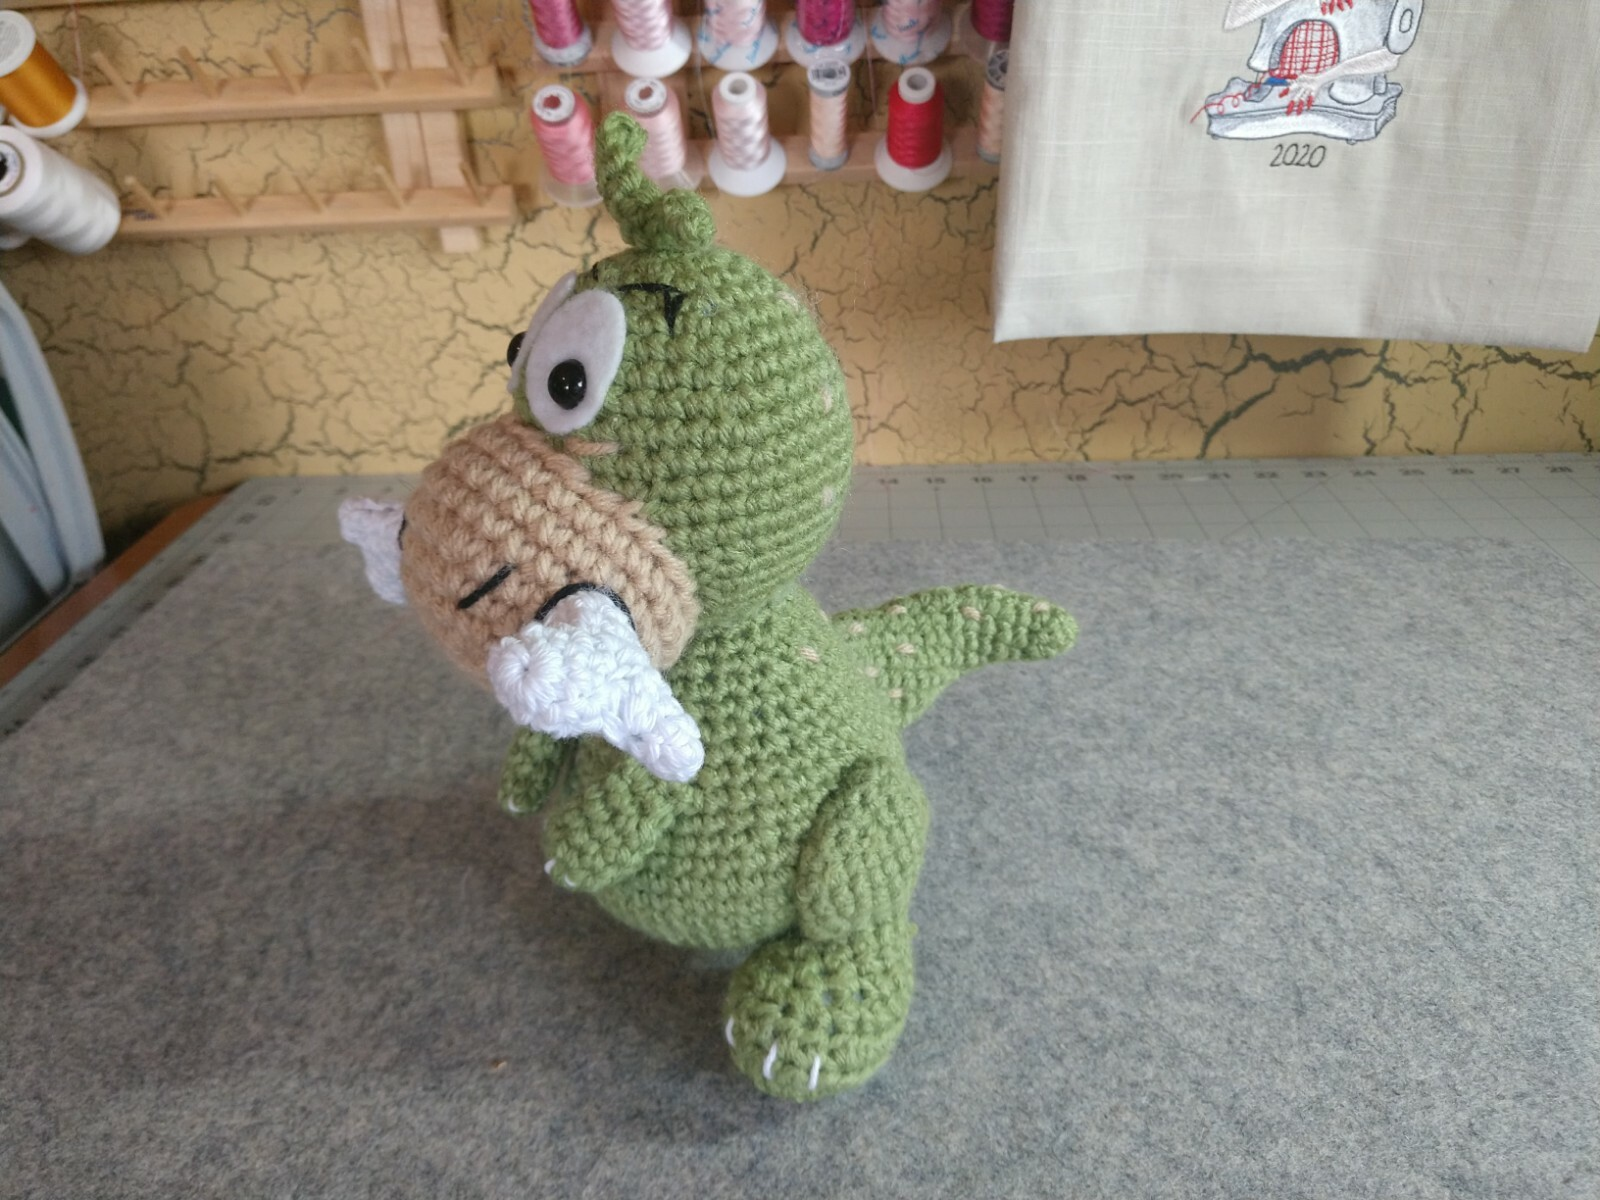 Albert the Dinosaur